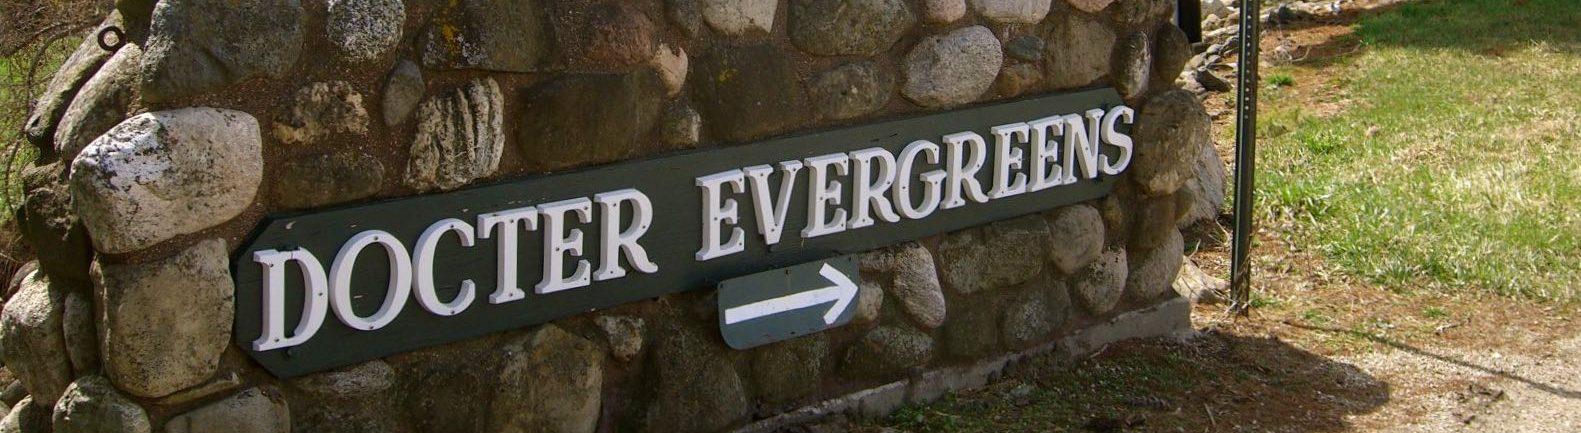 Docter Evergreens